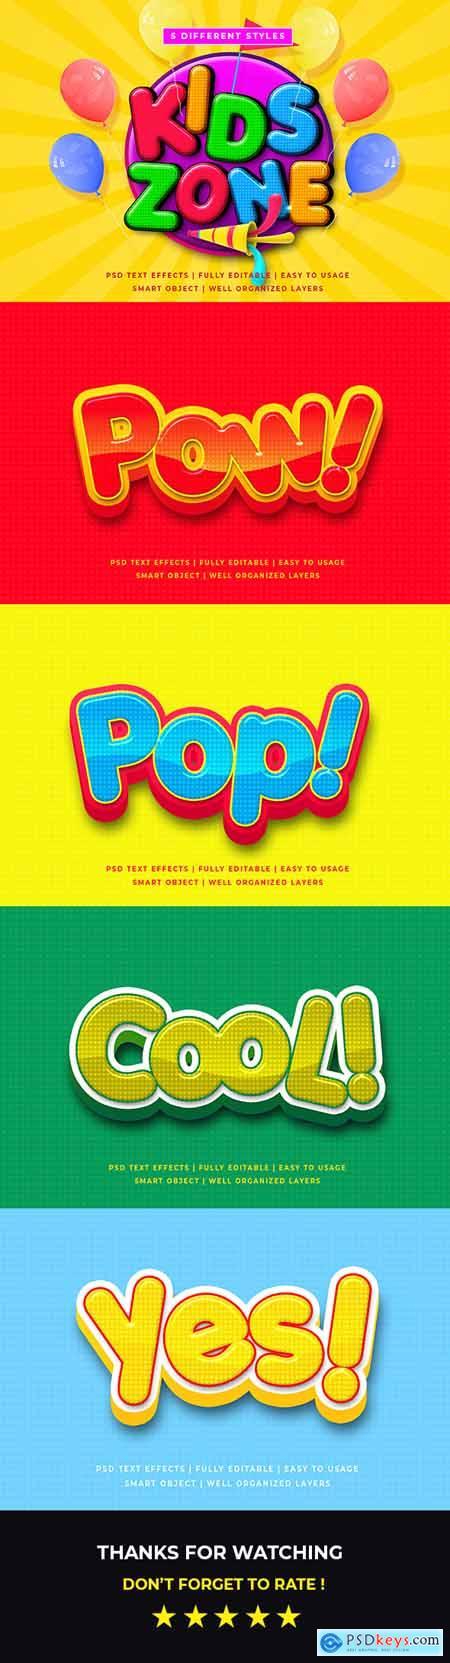 Kid Zone Cartoon 3d Text Style Effect Mockup 26208519